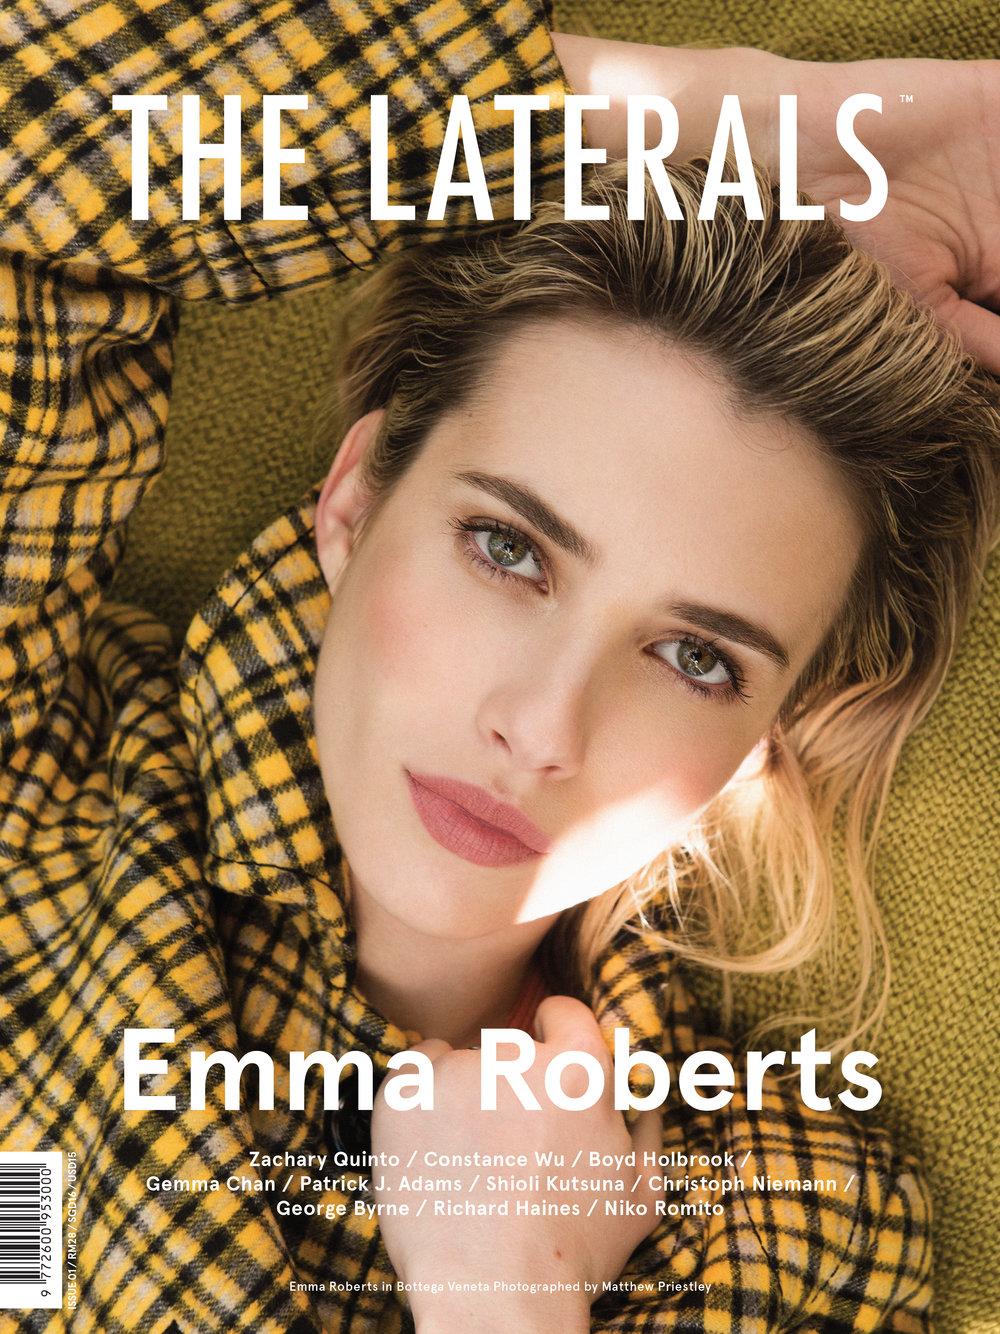 The Laterals Magazine  / Emma Roberts